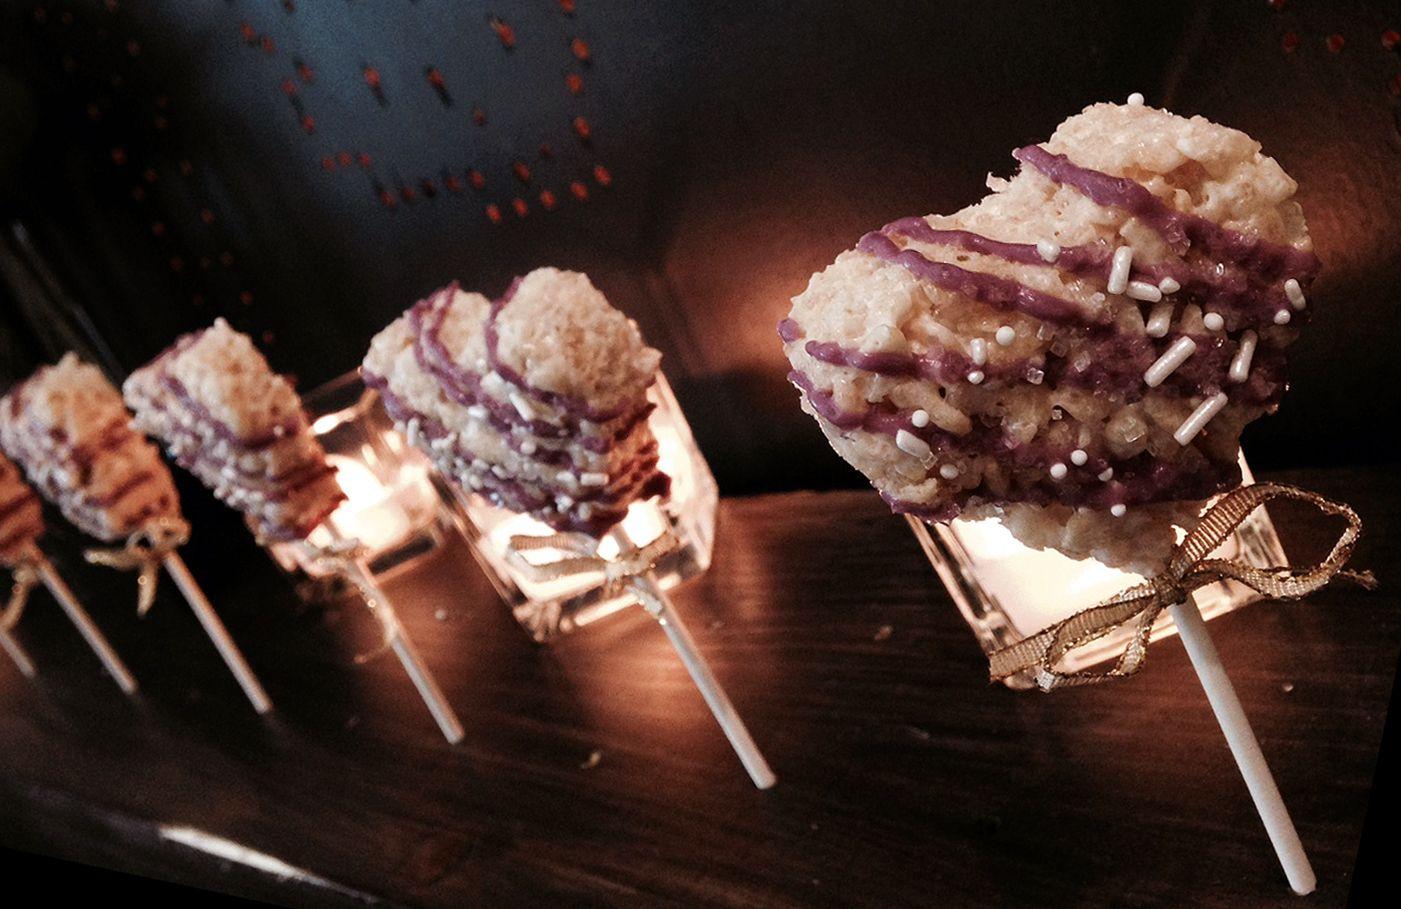 More fun Mini Sweets - Mini heart Rice Krispies on a stick ...